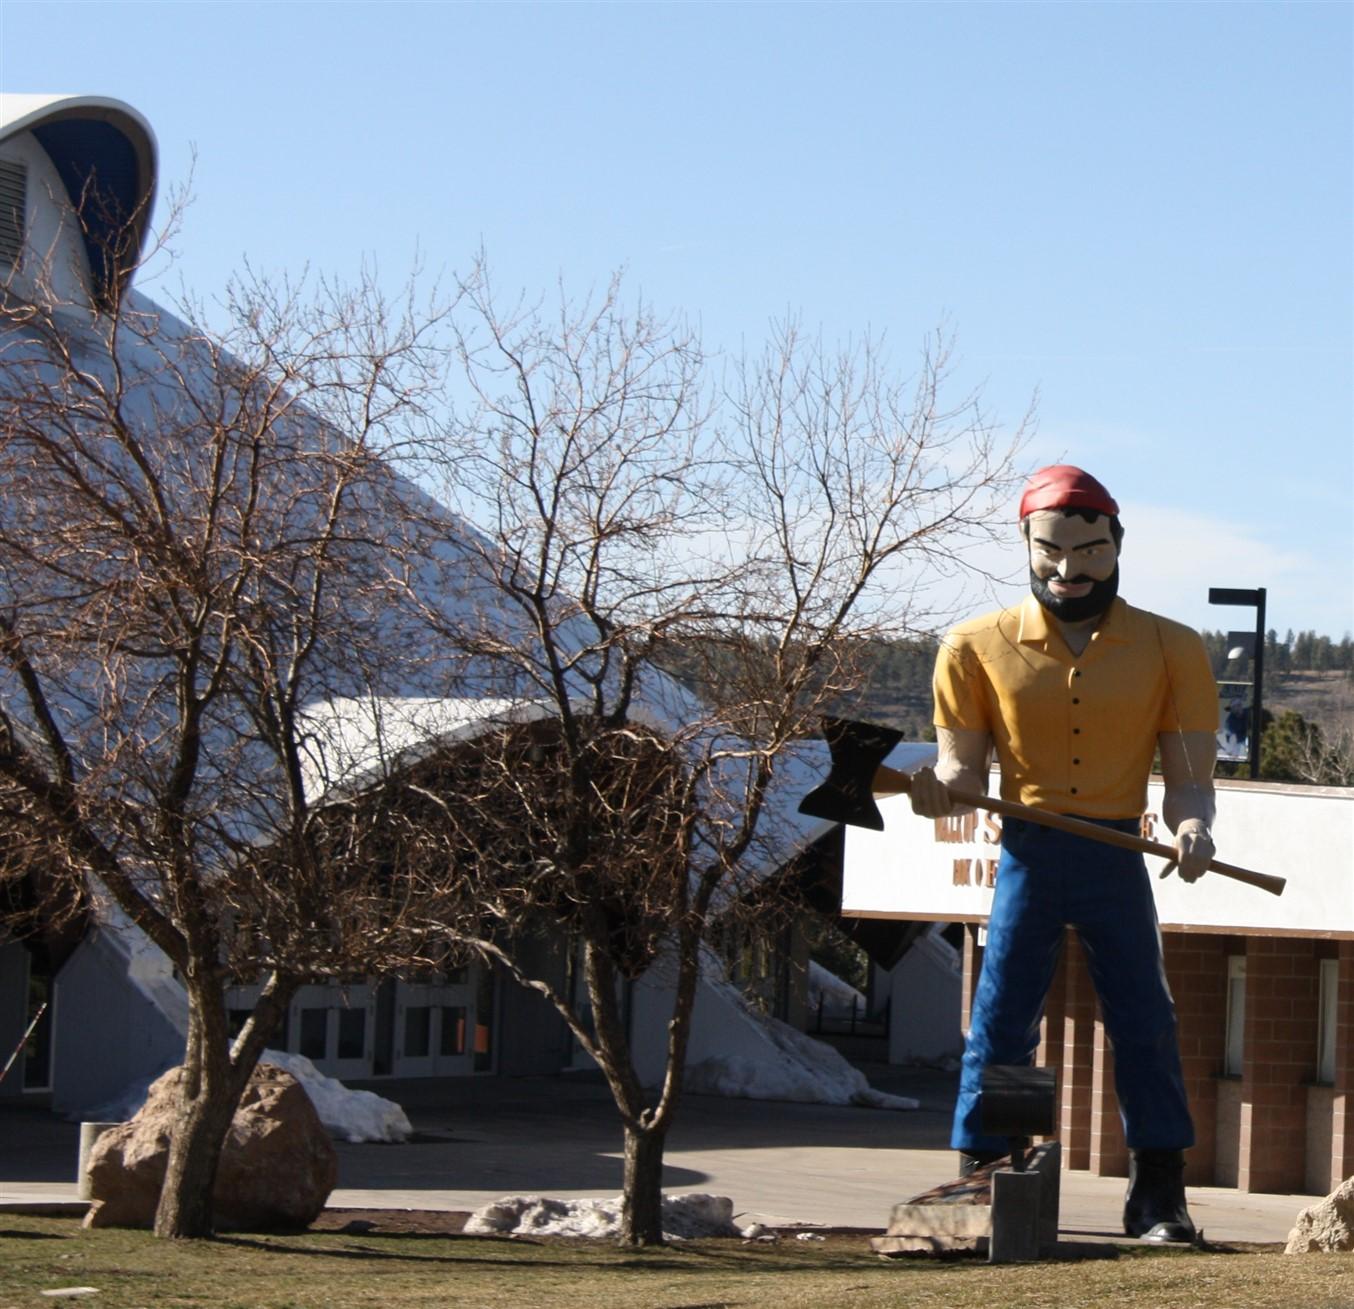 2012 03 14 Route 66 Road Trip 226 Flagstaff Arizona.jpg